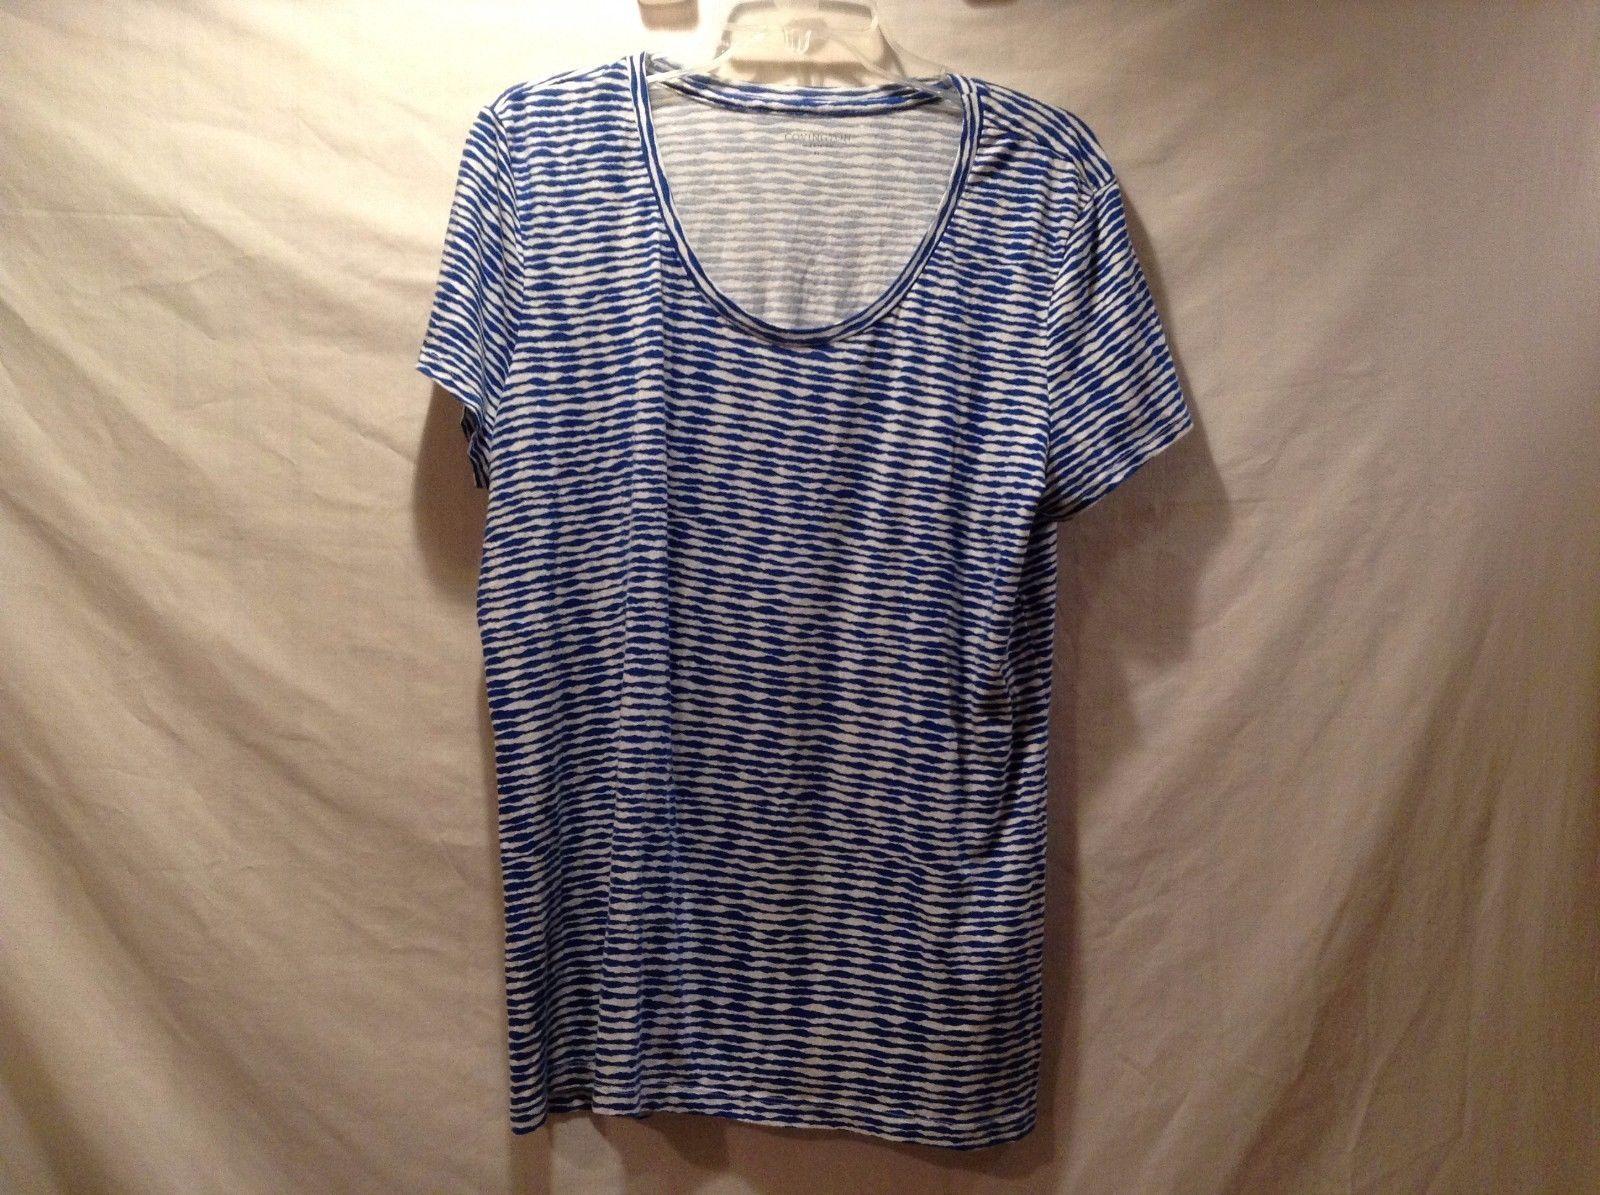 Great Covington XL Cotton Blend Blue White Horizontal Jagged Line Shirt